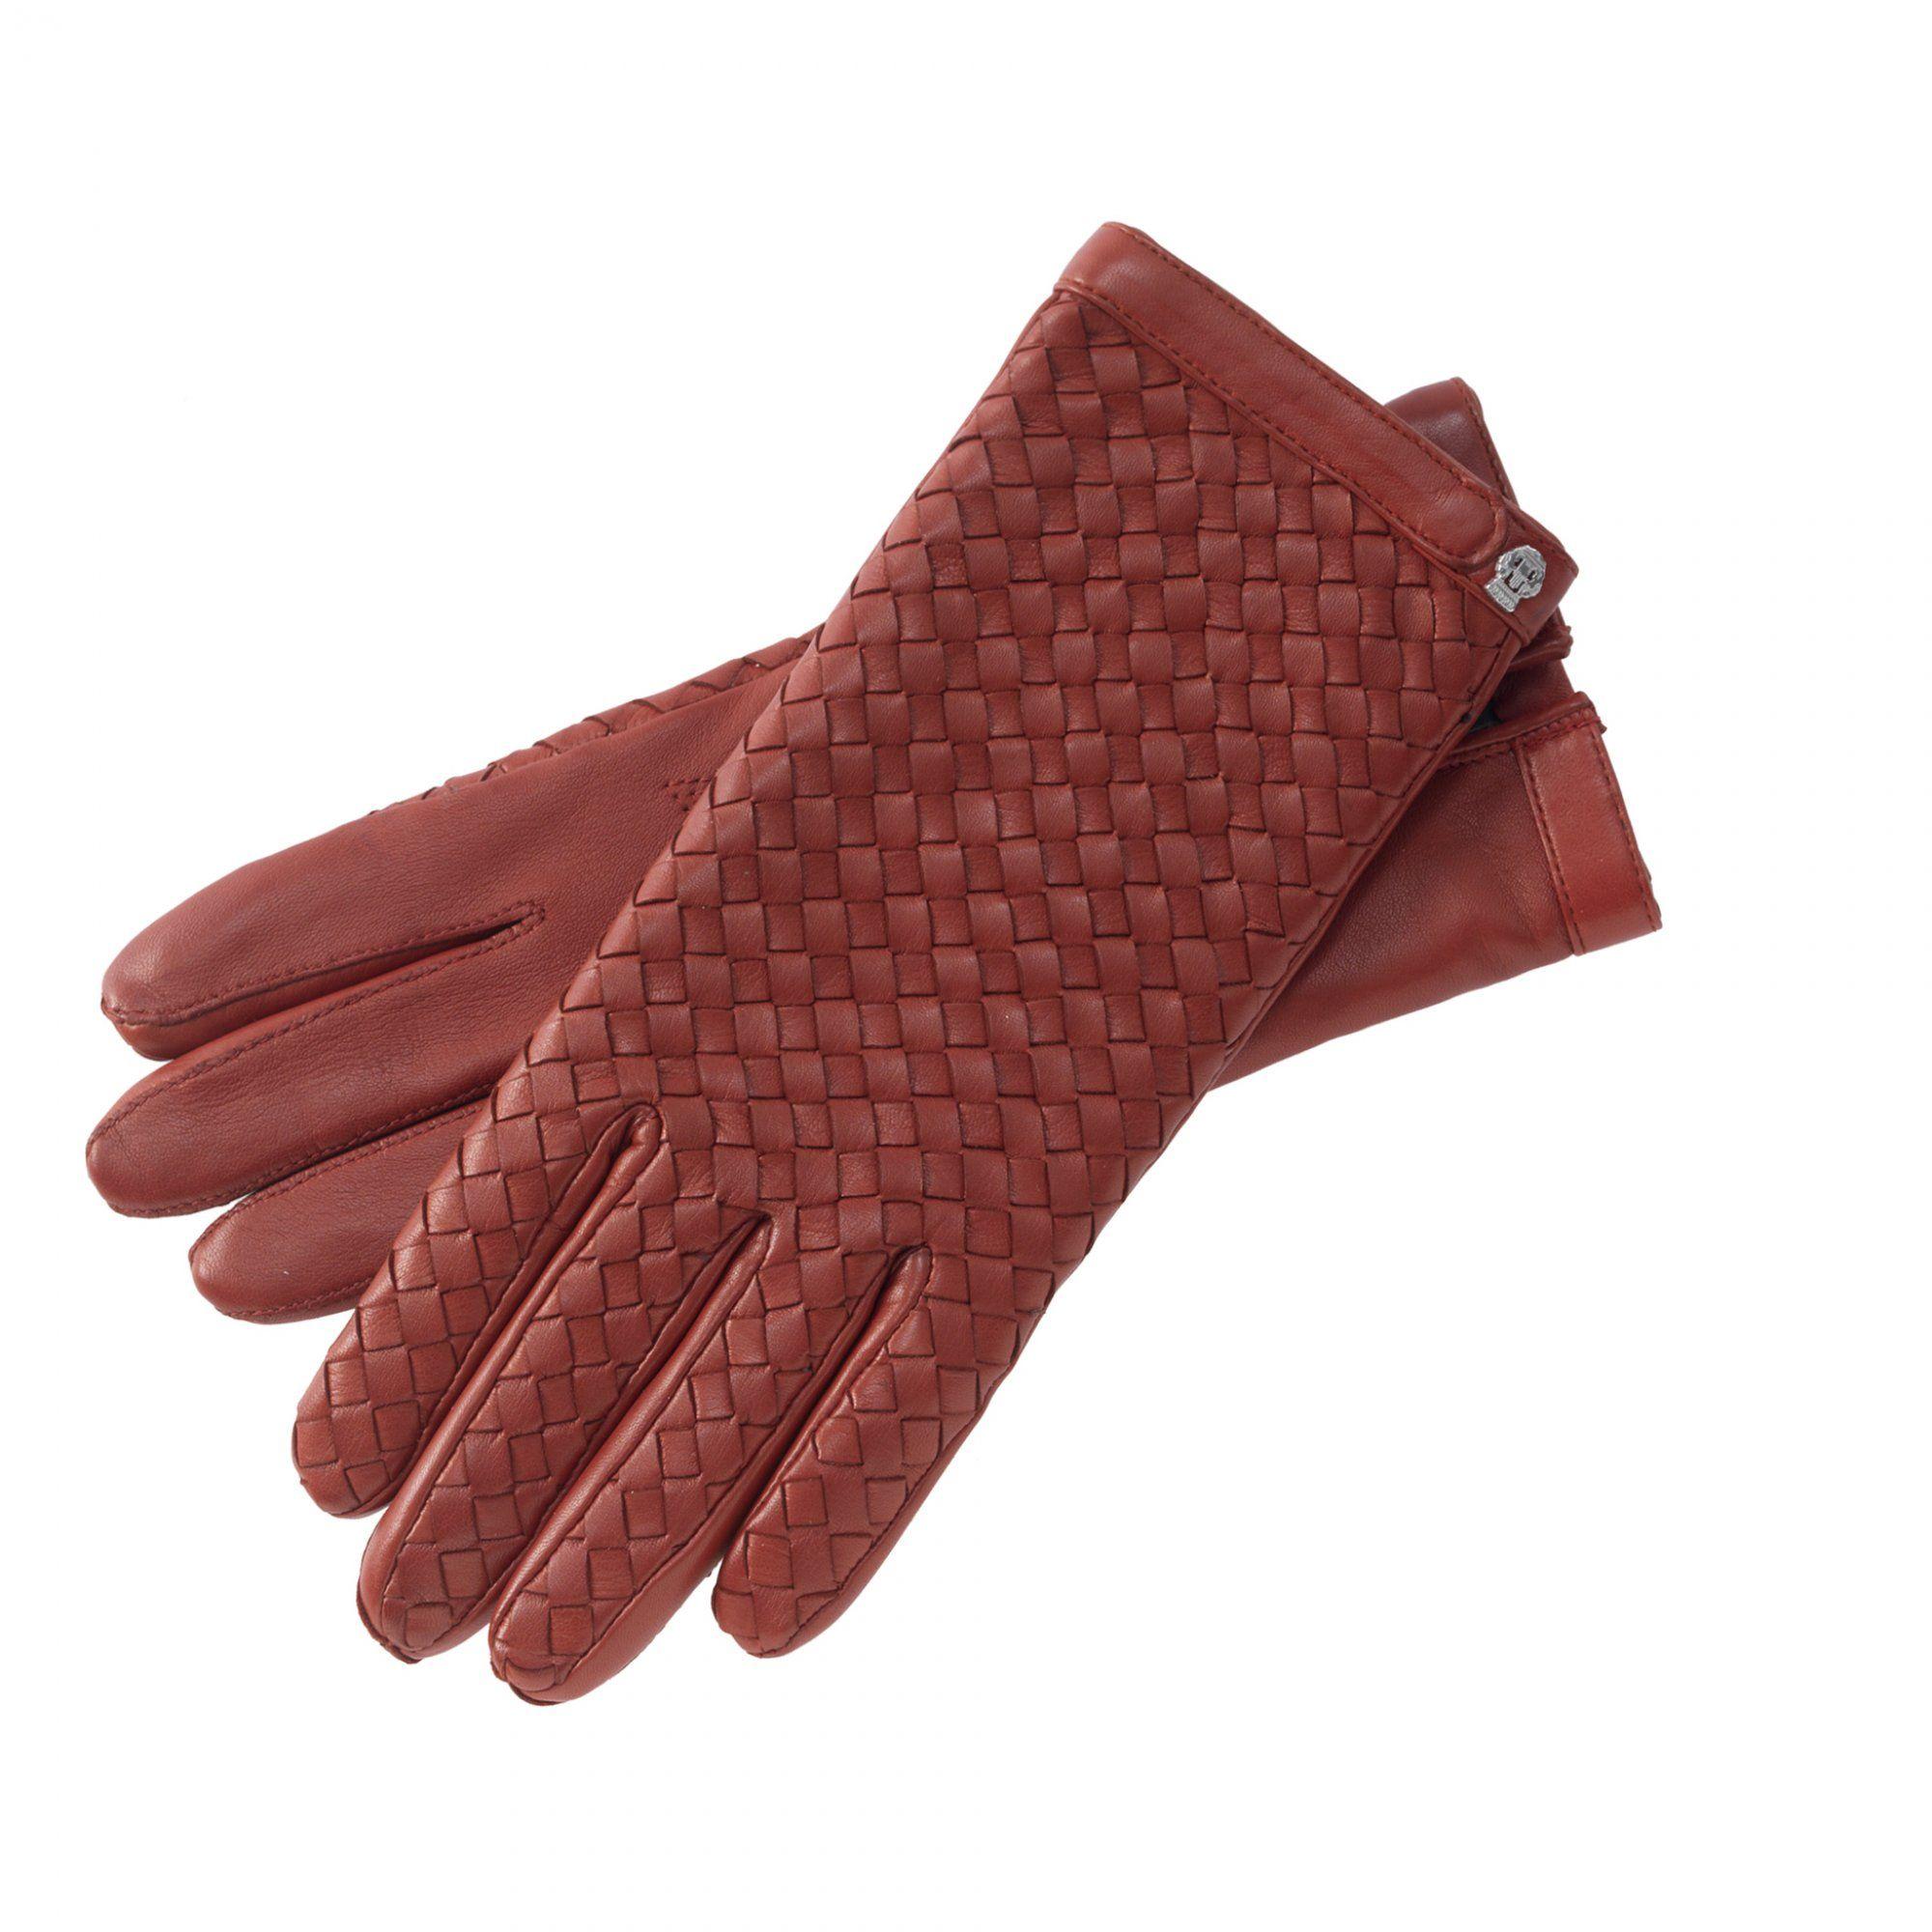 Pure Weaving / 11012-355-450 / Roeckl